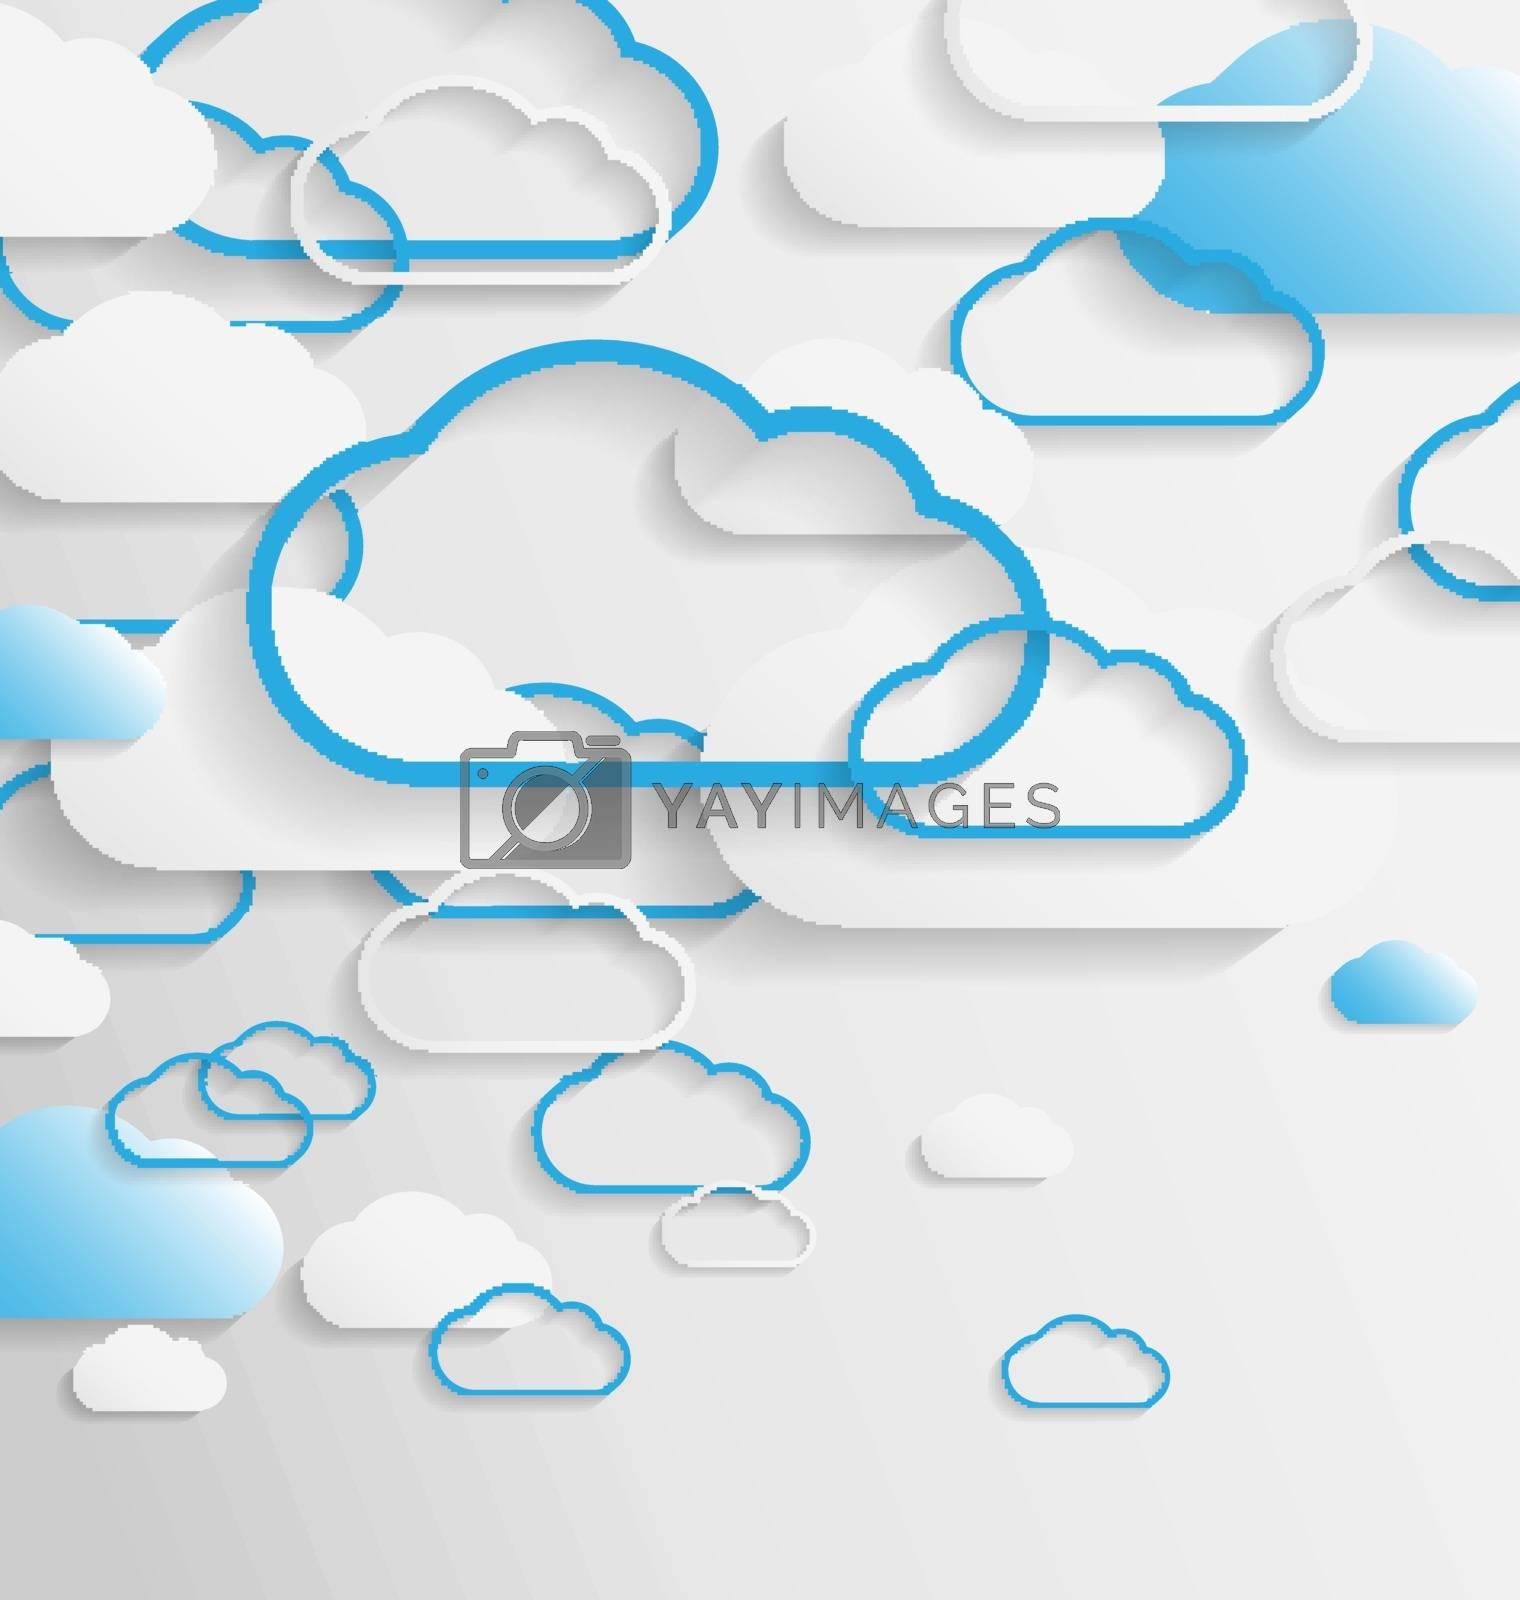 Elegant empty clouds on blue background for creative tasks